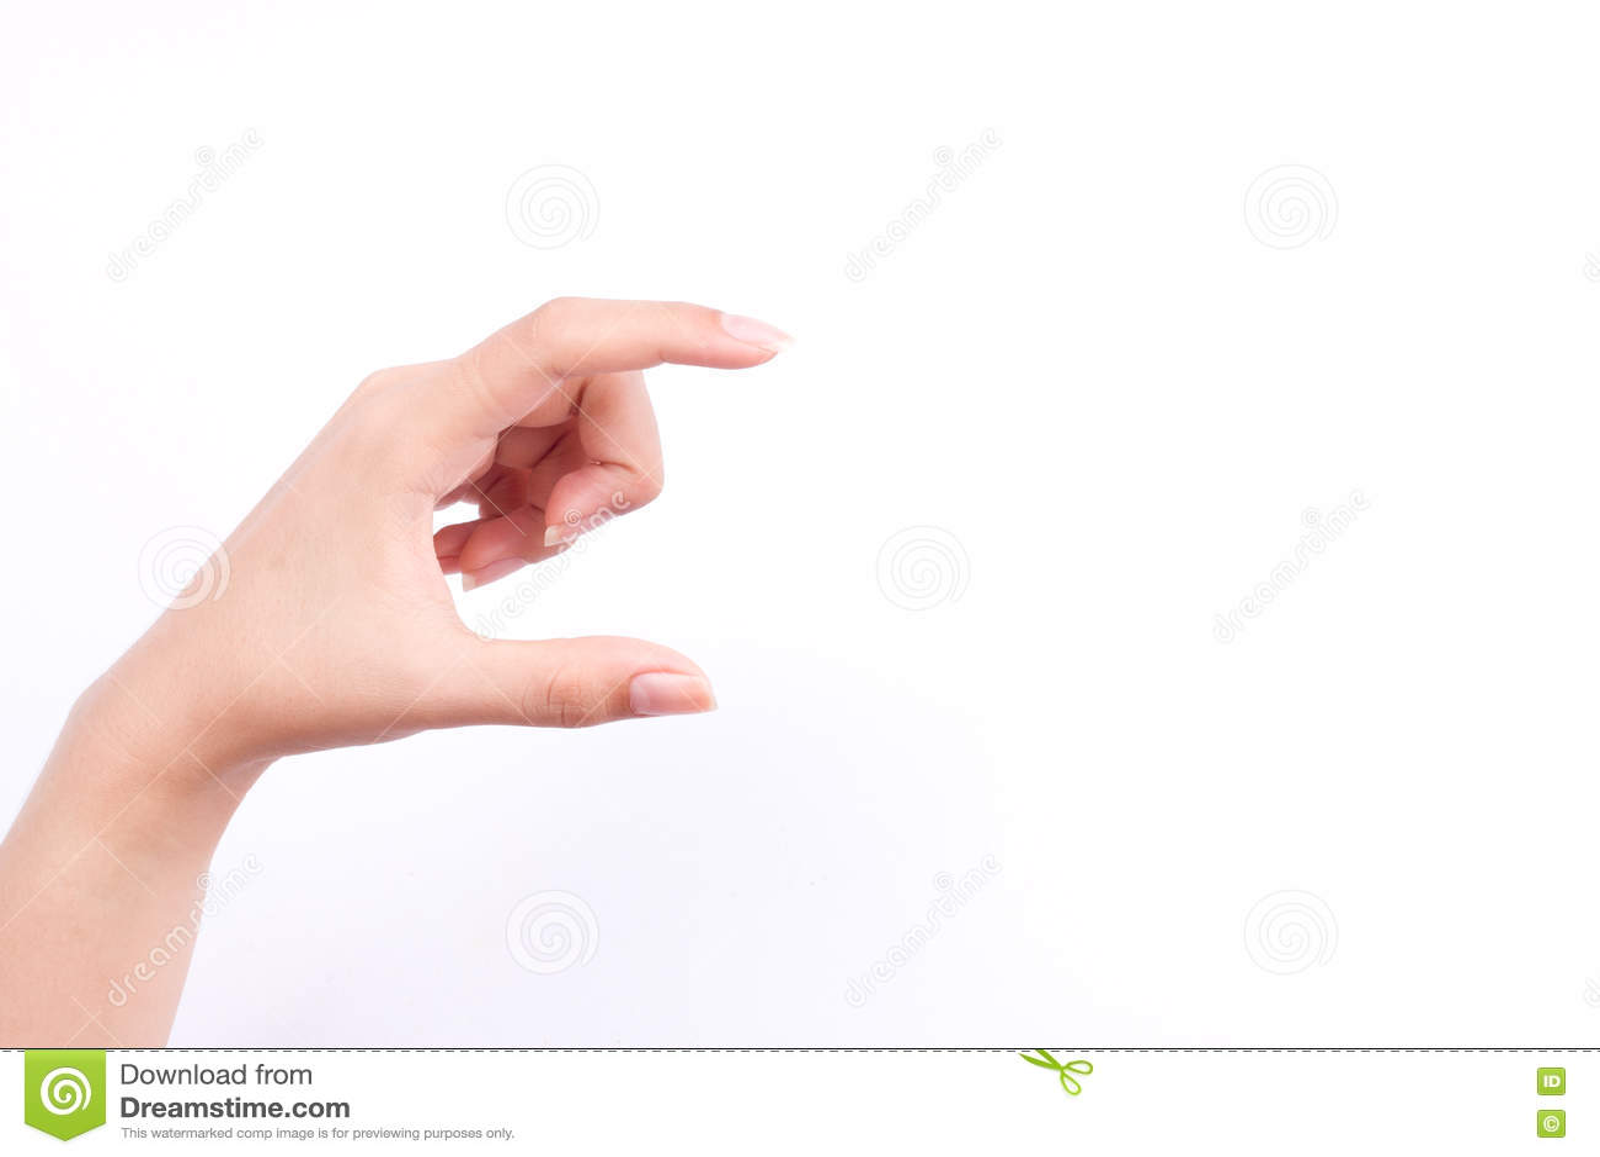 Finger Hand Symbols Concept Woman Hand Holding A Futuristic ...